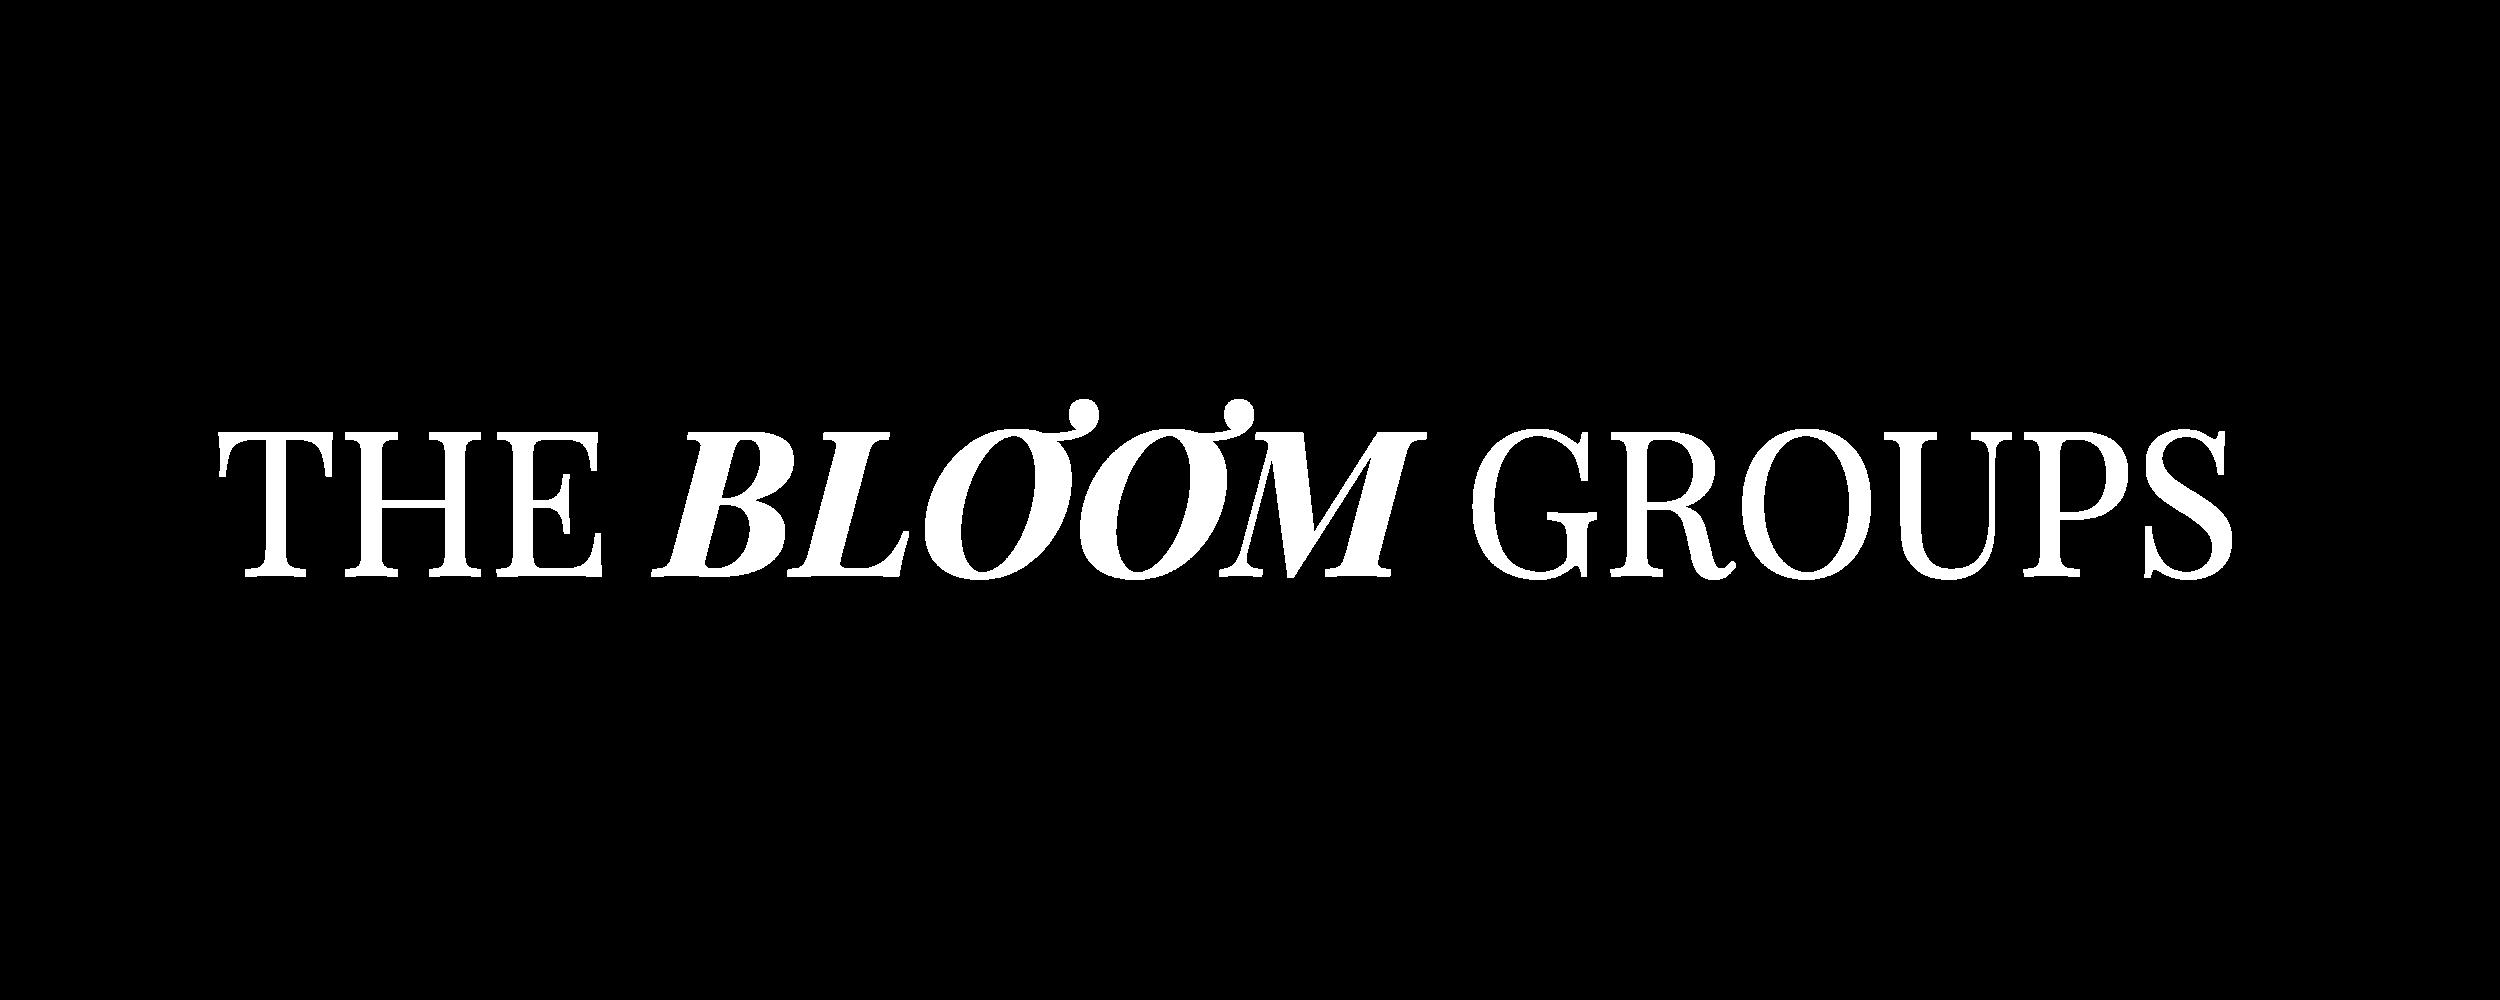 bloomgroupsheader-02.png